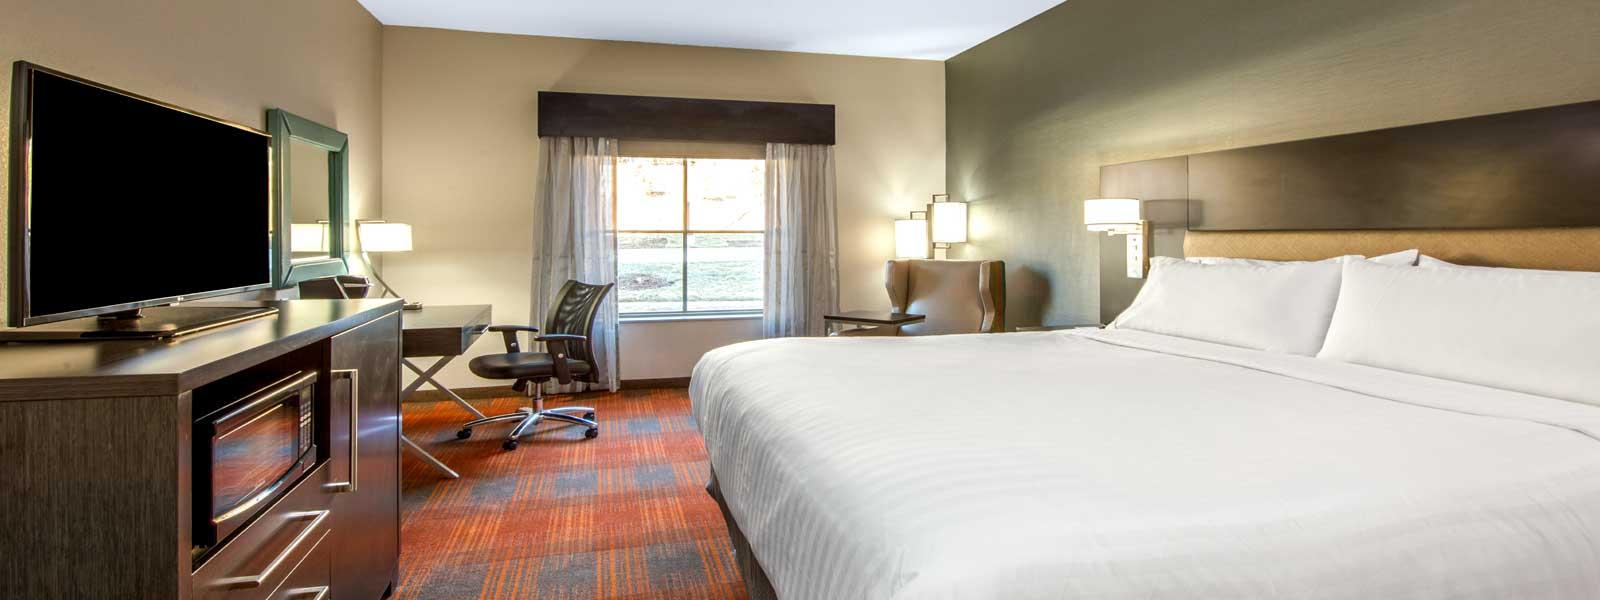 Holiday Inn Express & Suites Kansas City West Shawnee Kansas KS ...